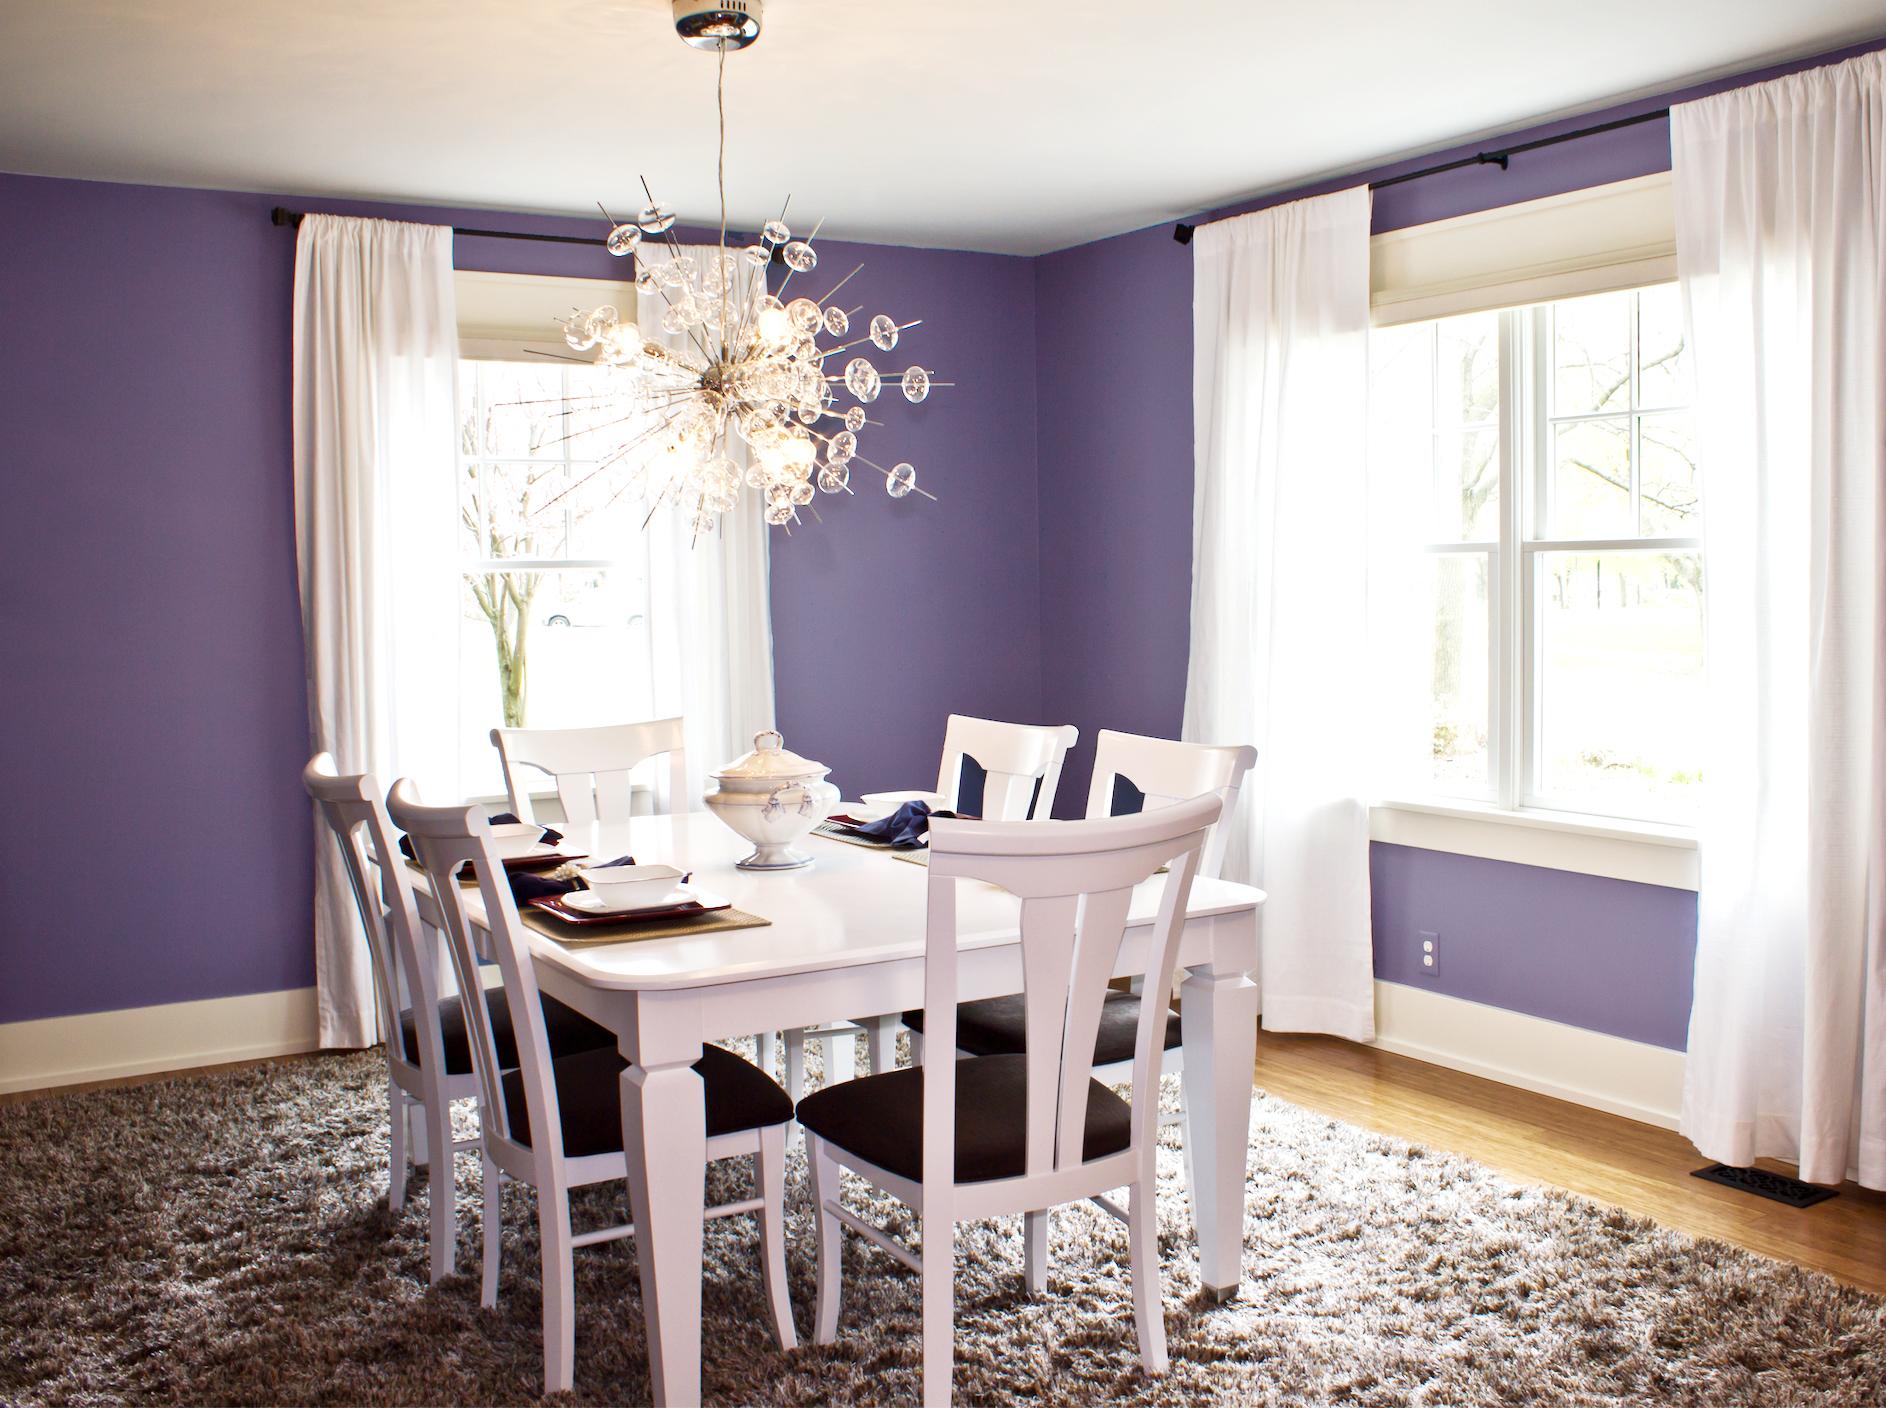 Pantone Color of the Year 2018 Fuchsia Design Interior Design